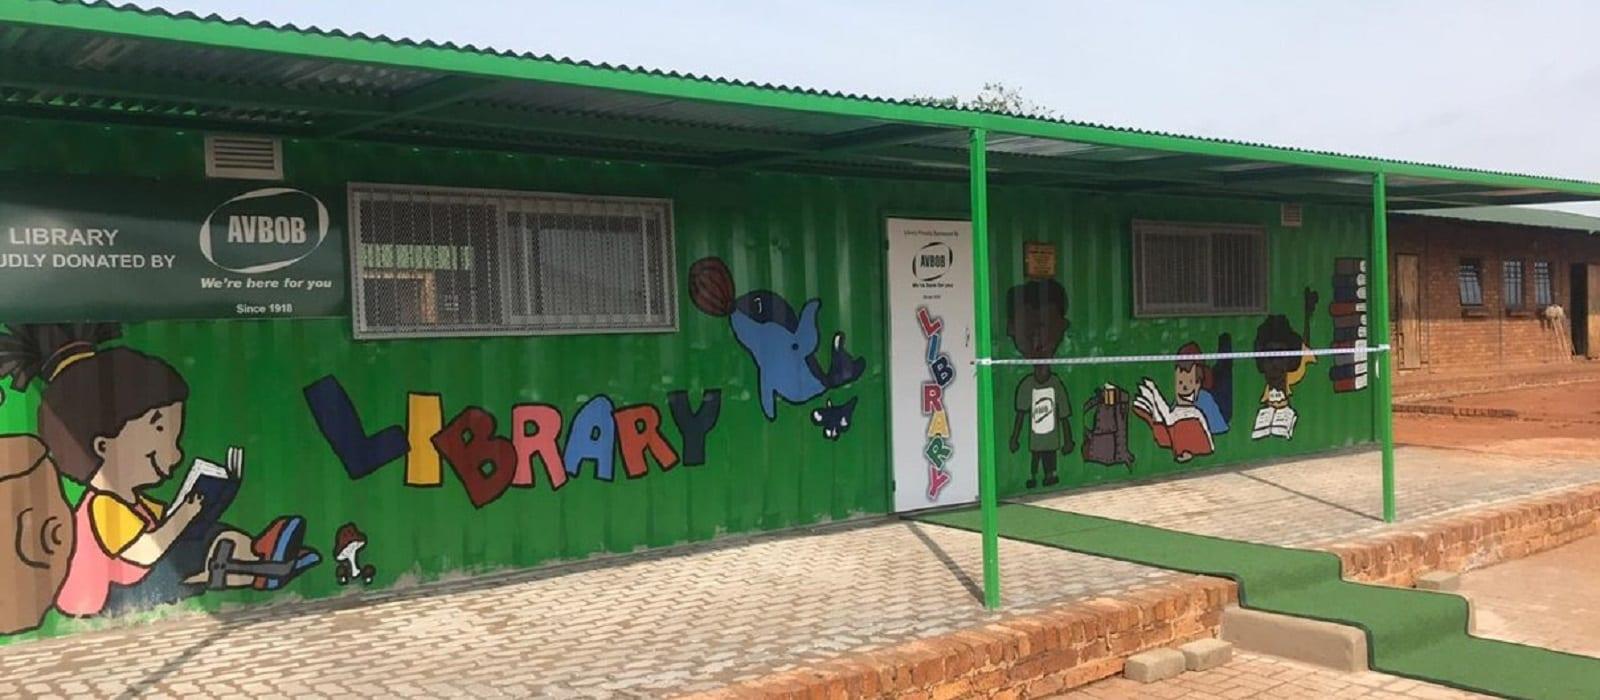 avbob-foundation-library